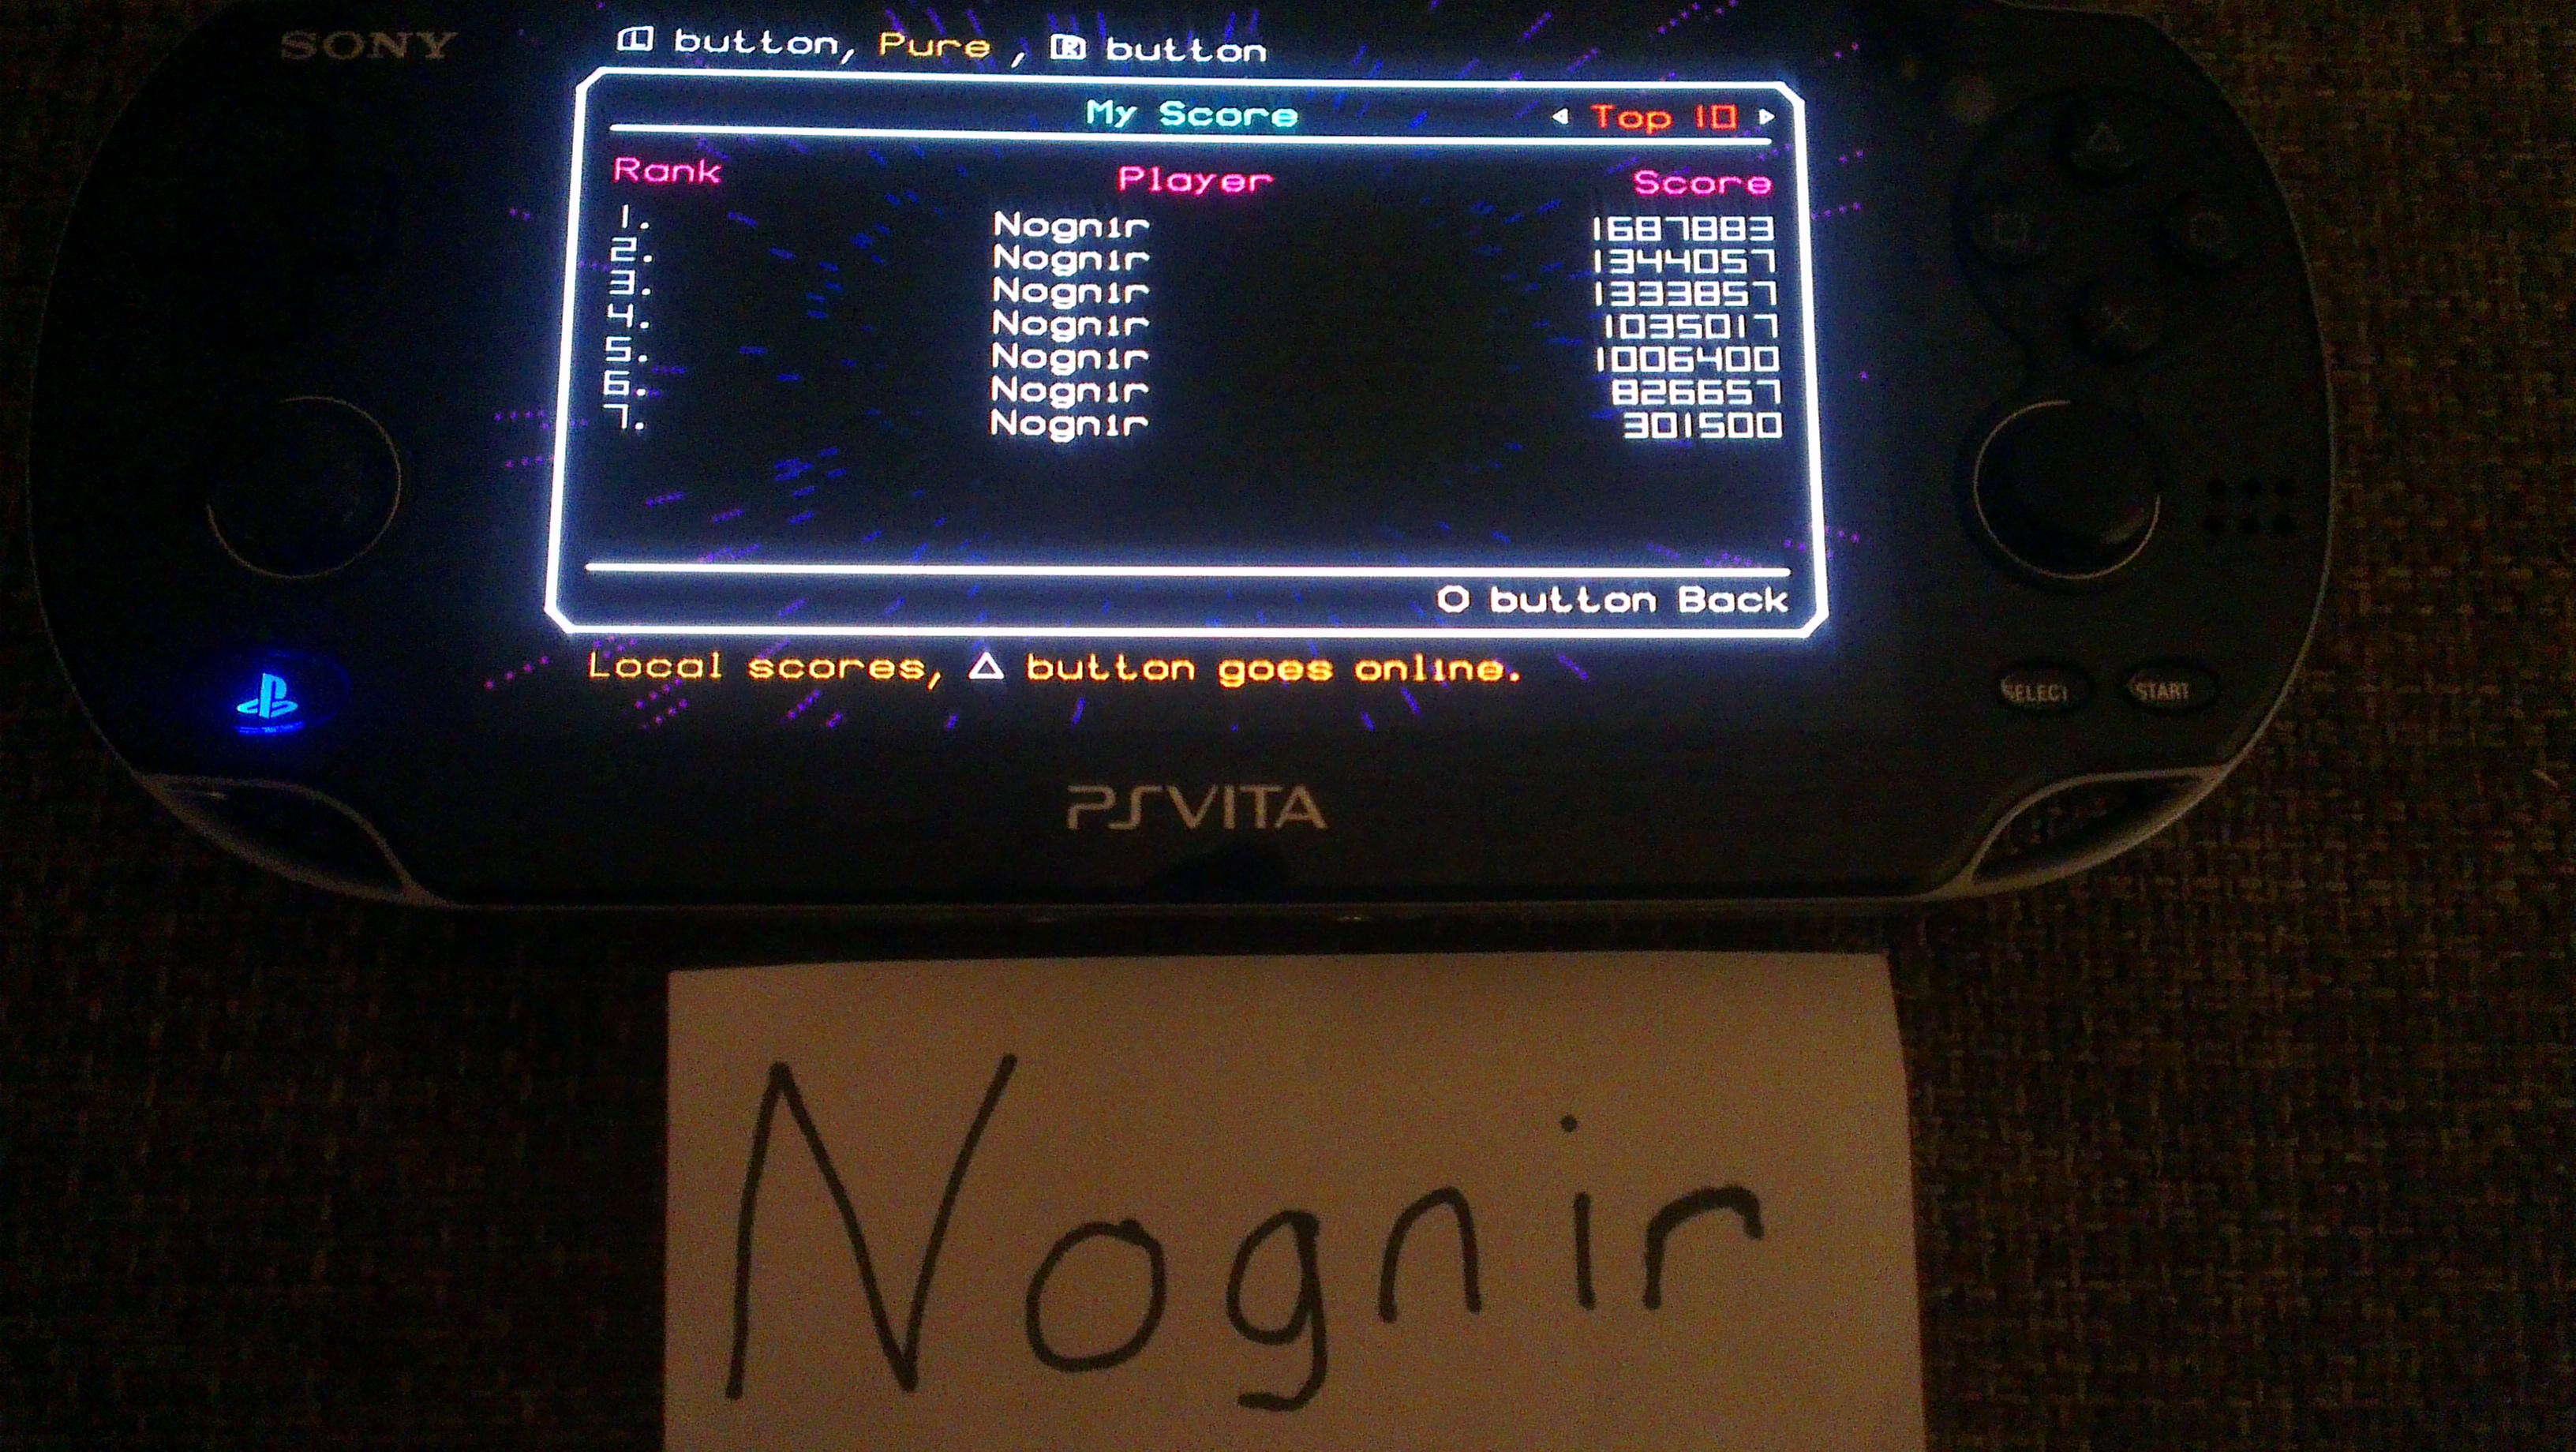 Nognir: TxK [Pure Mode] (PS Vita) 1,687,883 points on 2014-04-09 16:48:31